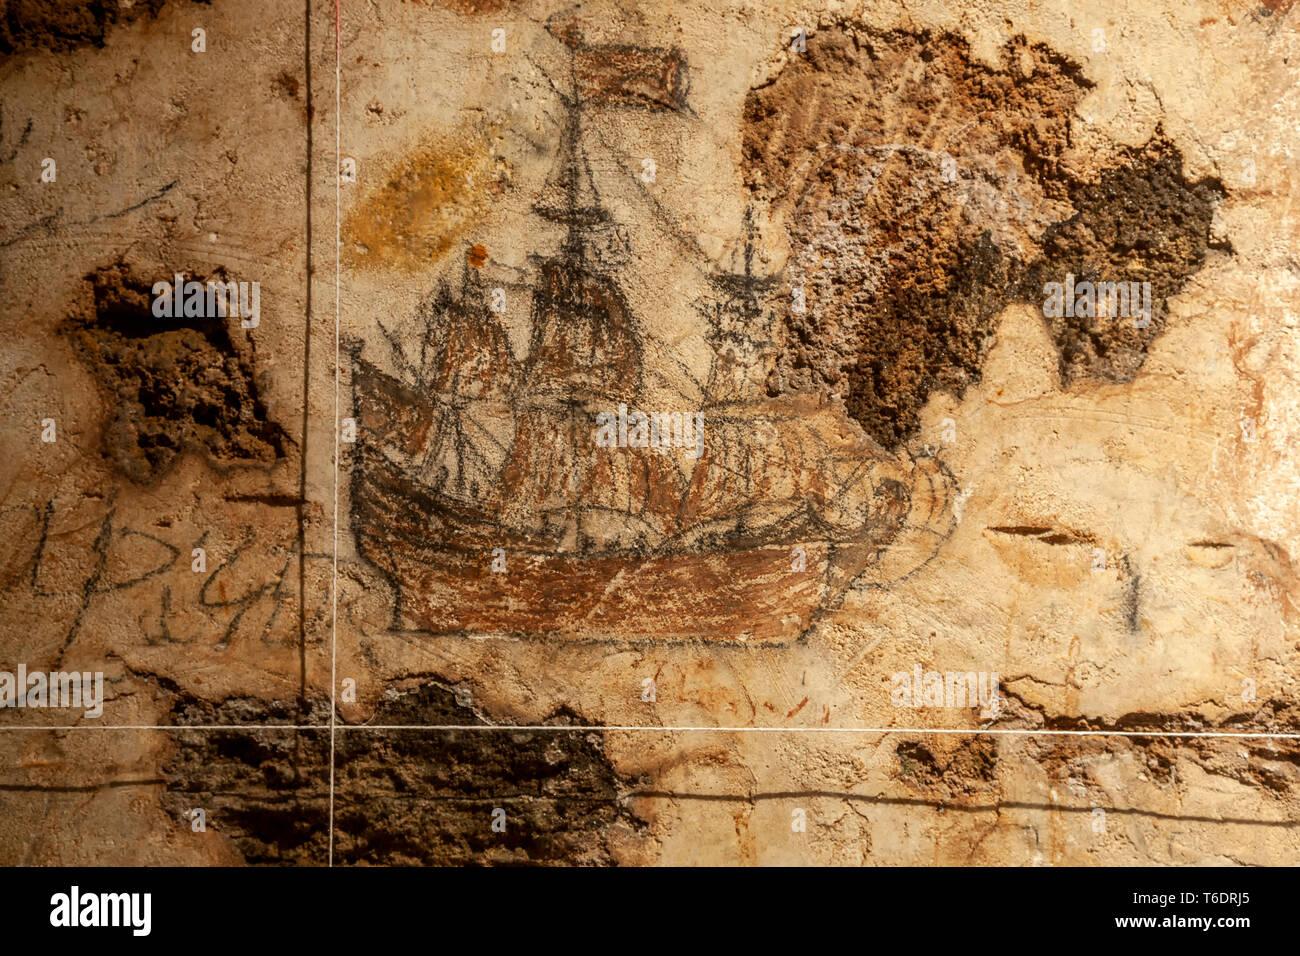 Graffiti depicting tall ship, dungeon, San Cristobal Castle, San Juan National Historic Site, Old San Juan, Puerto Rico - Stock Image